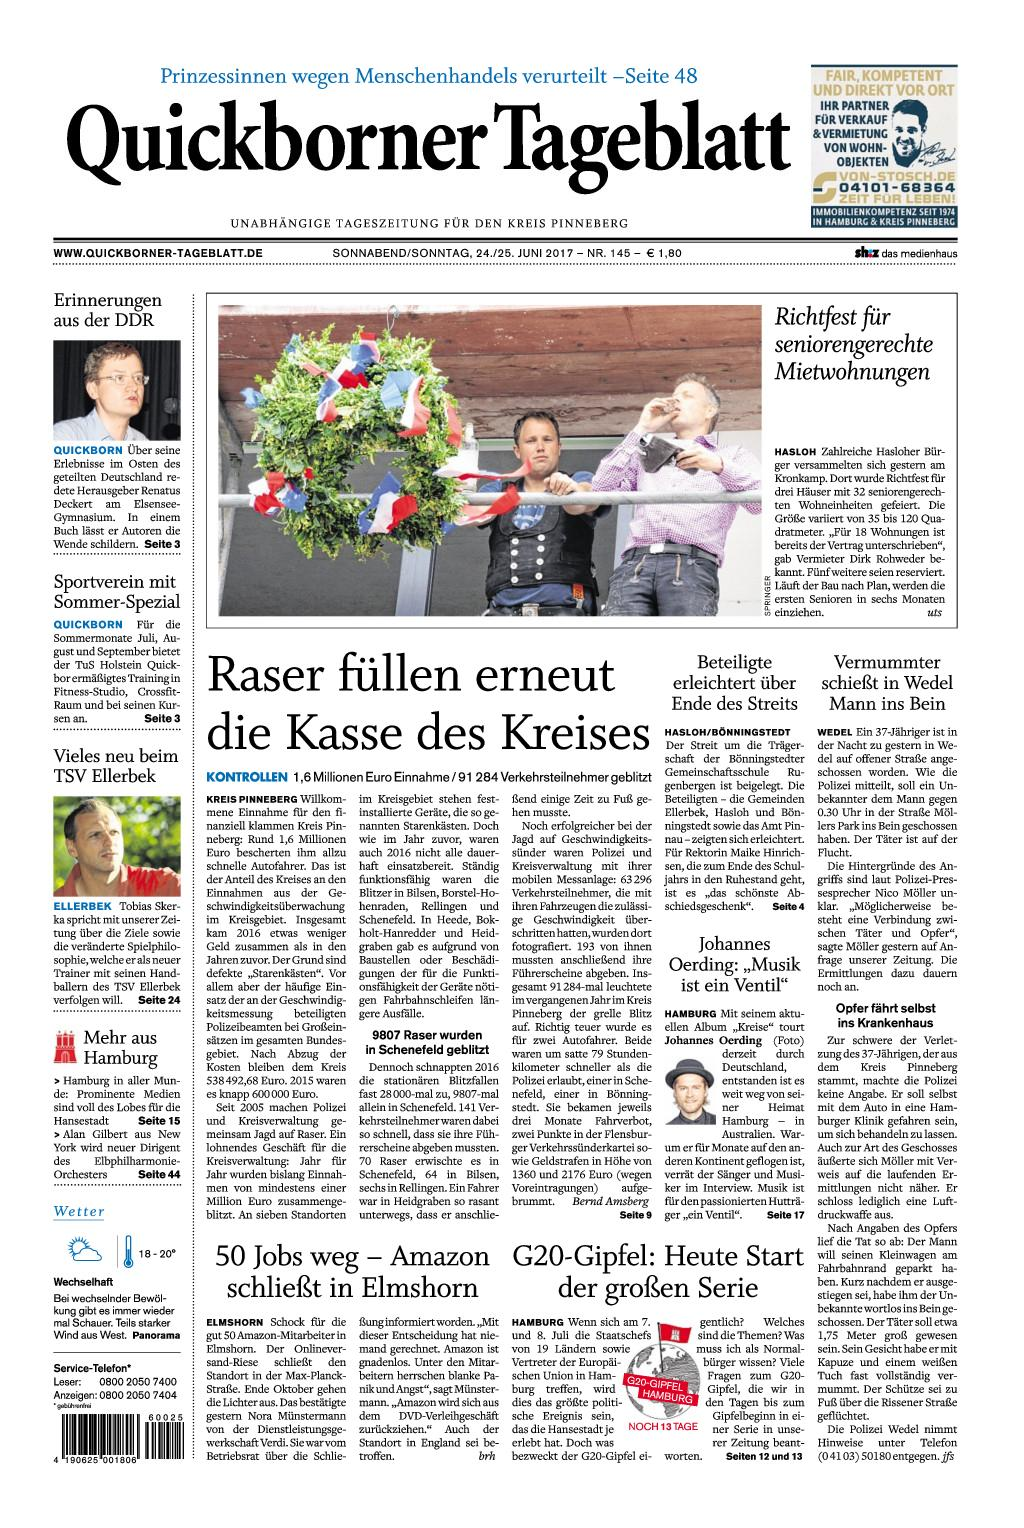 Quickborner Tageblatt 24 Juni 2017